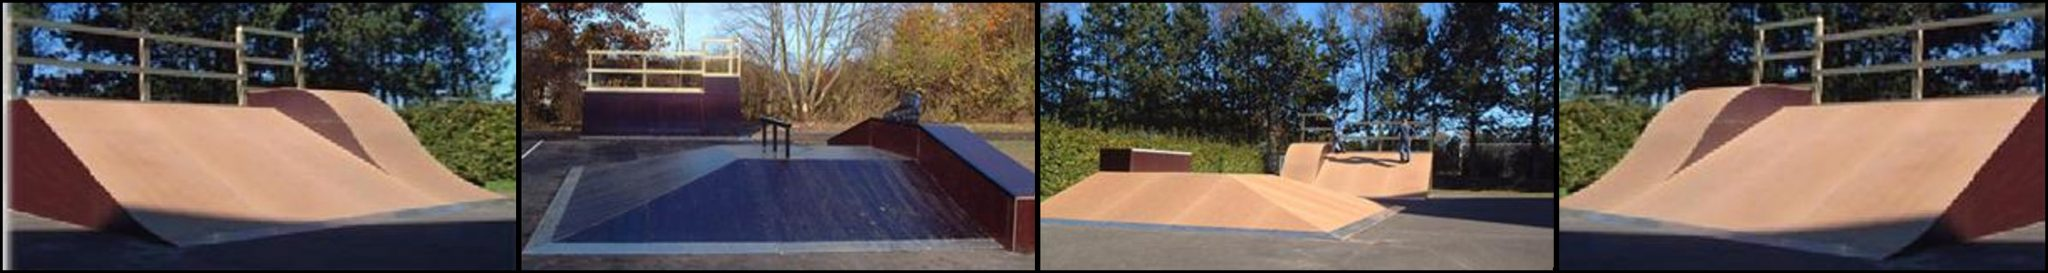 skateboard kombi anlæg